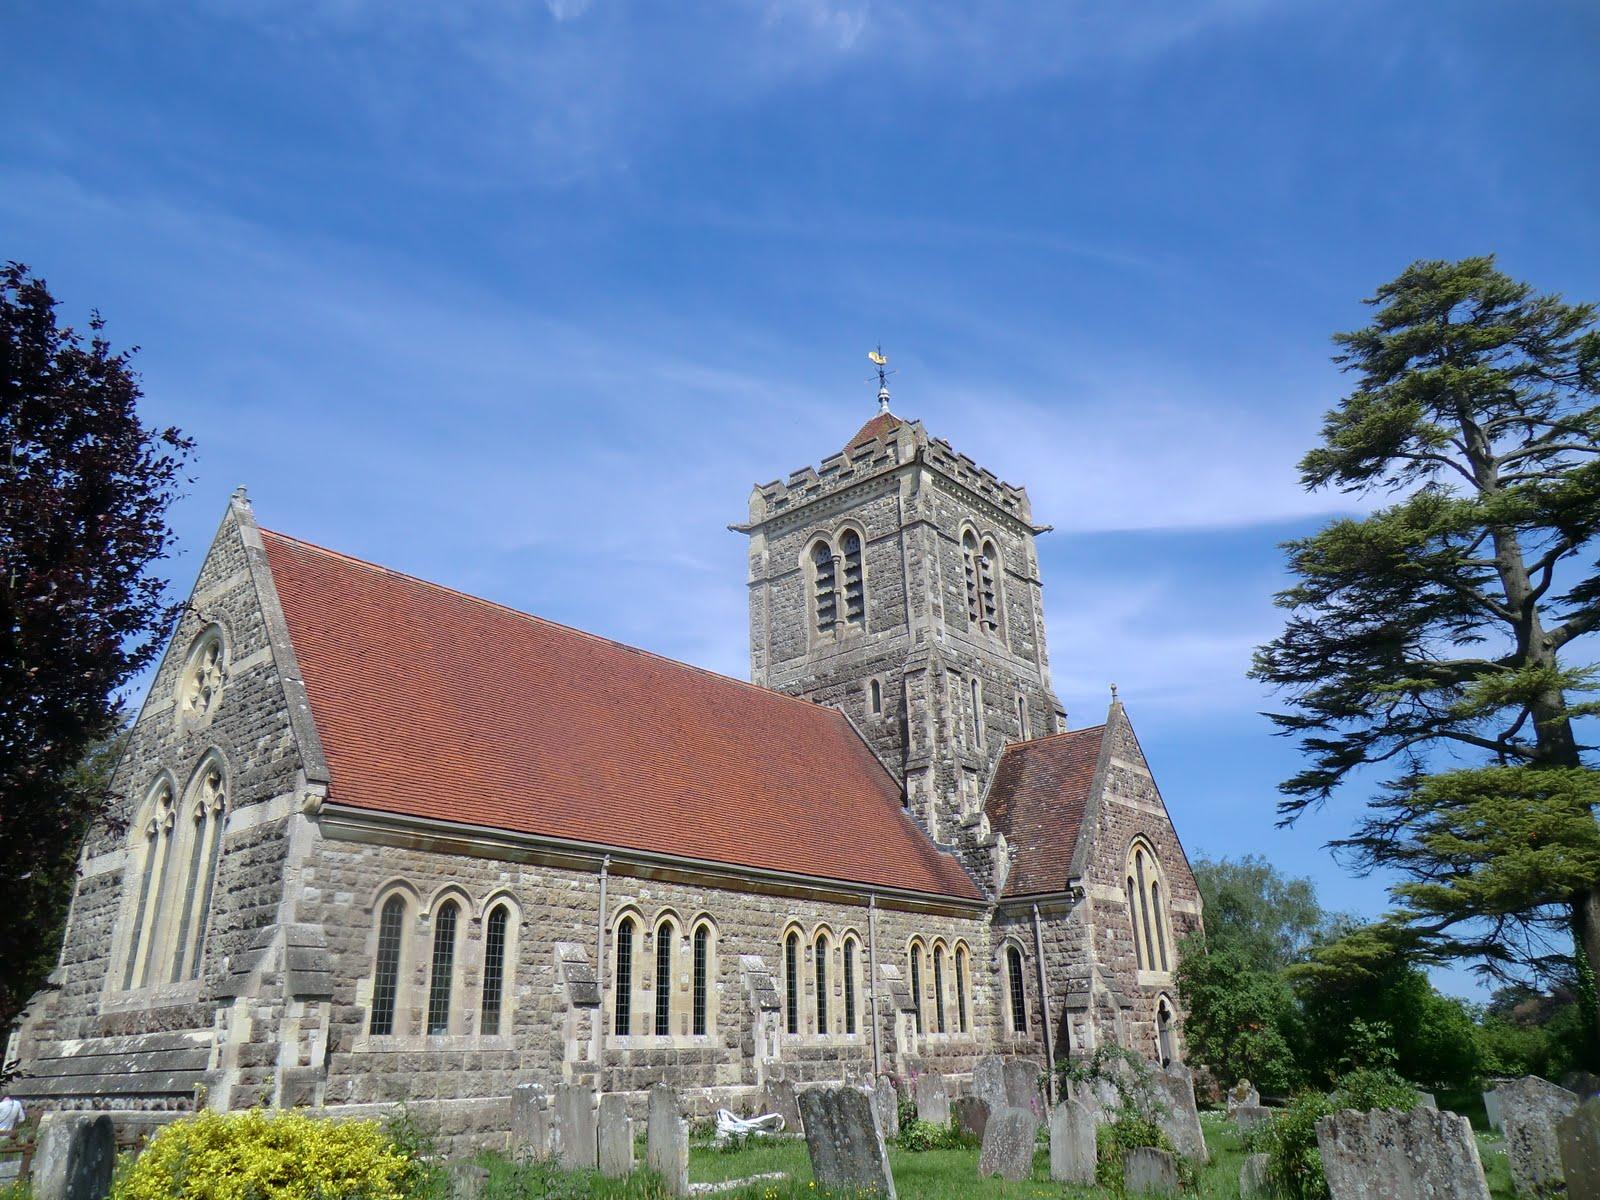 CIMG1427 St Giles' church, Shipbourne